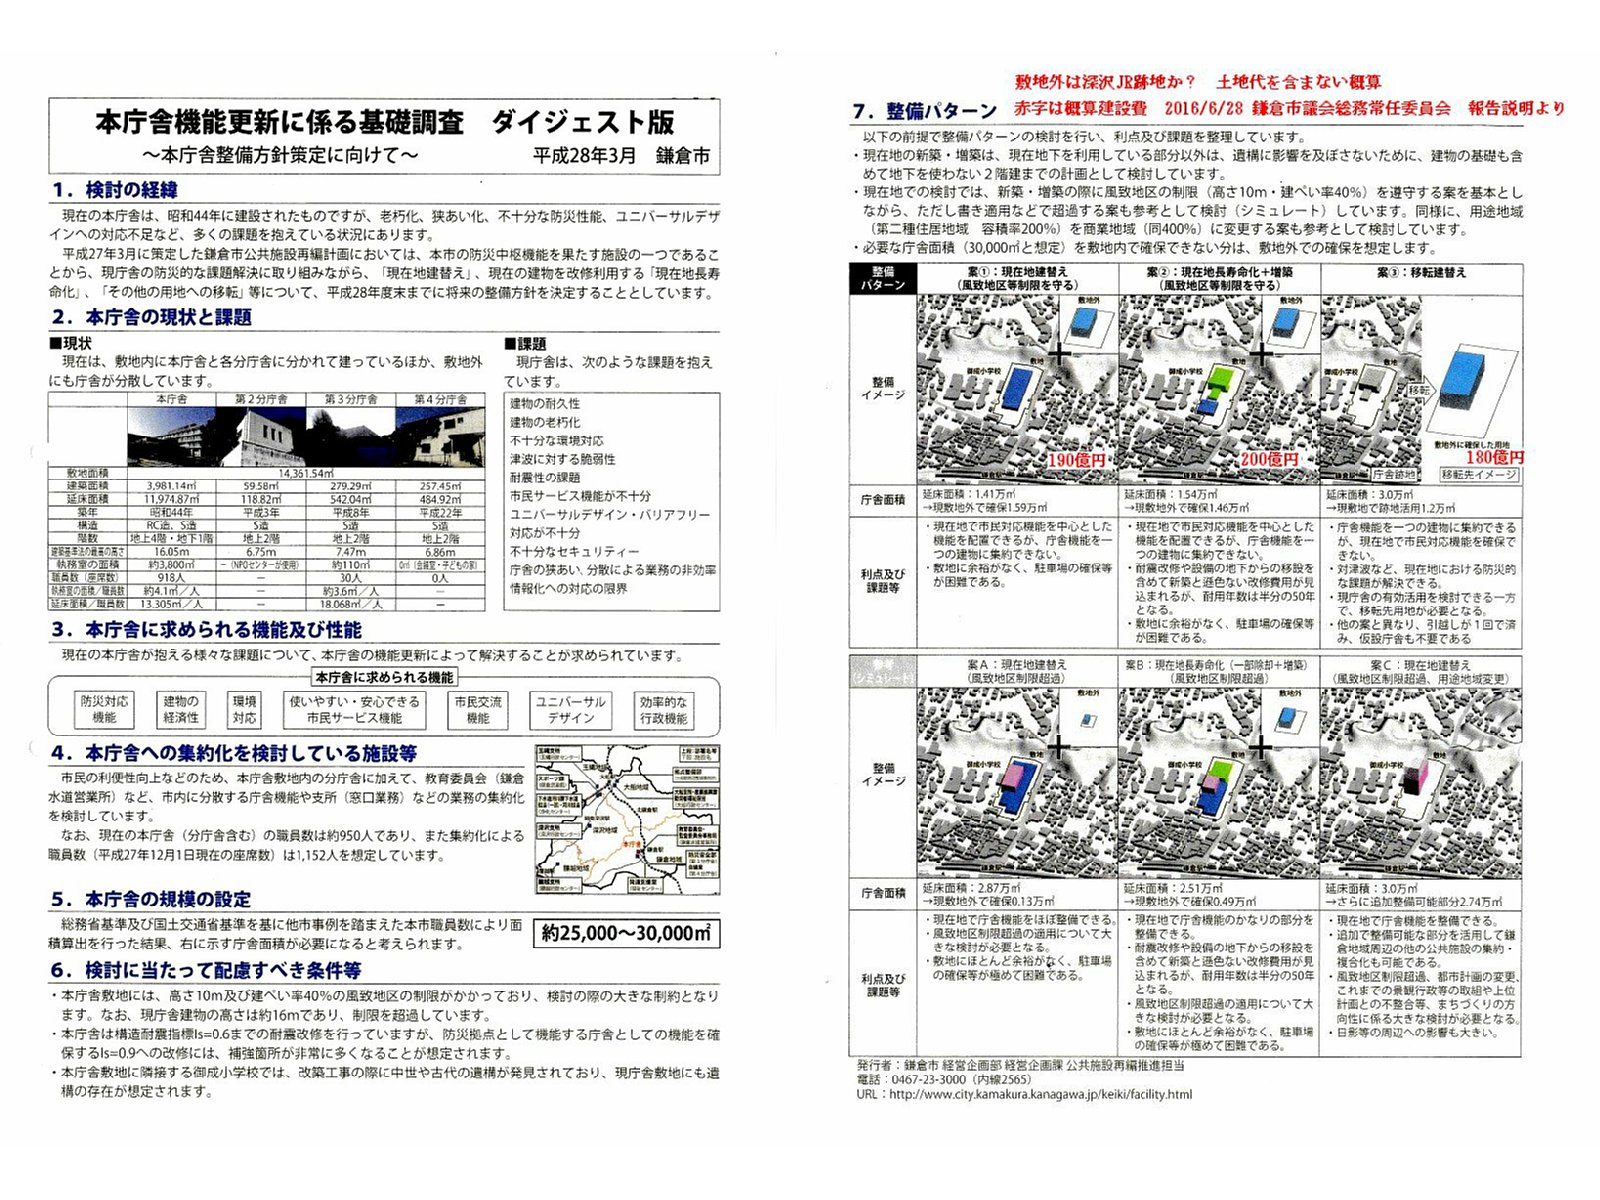 http://fujikama.coolblog.jp/2015/SEP/20160629.jpg